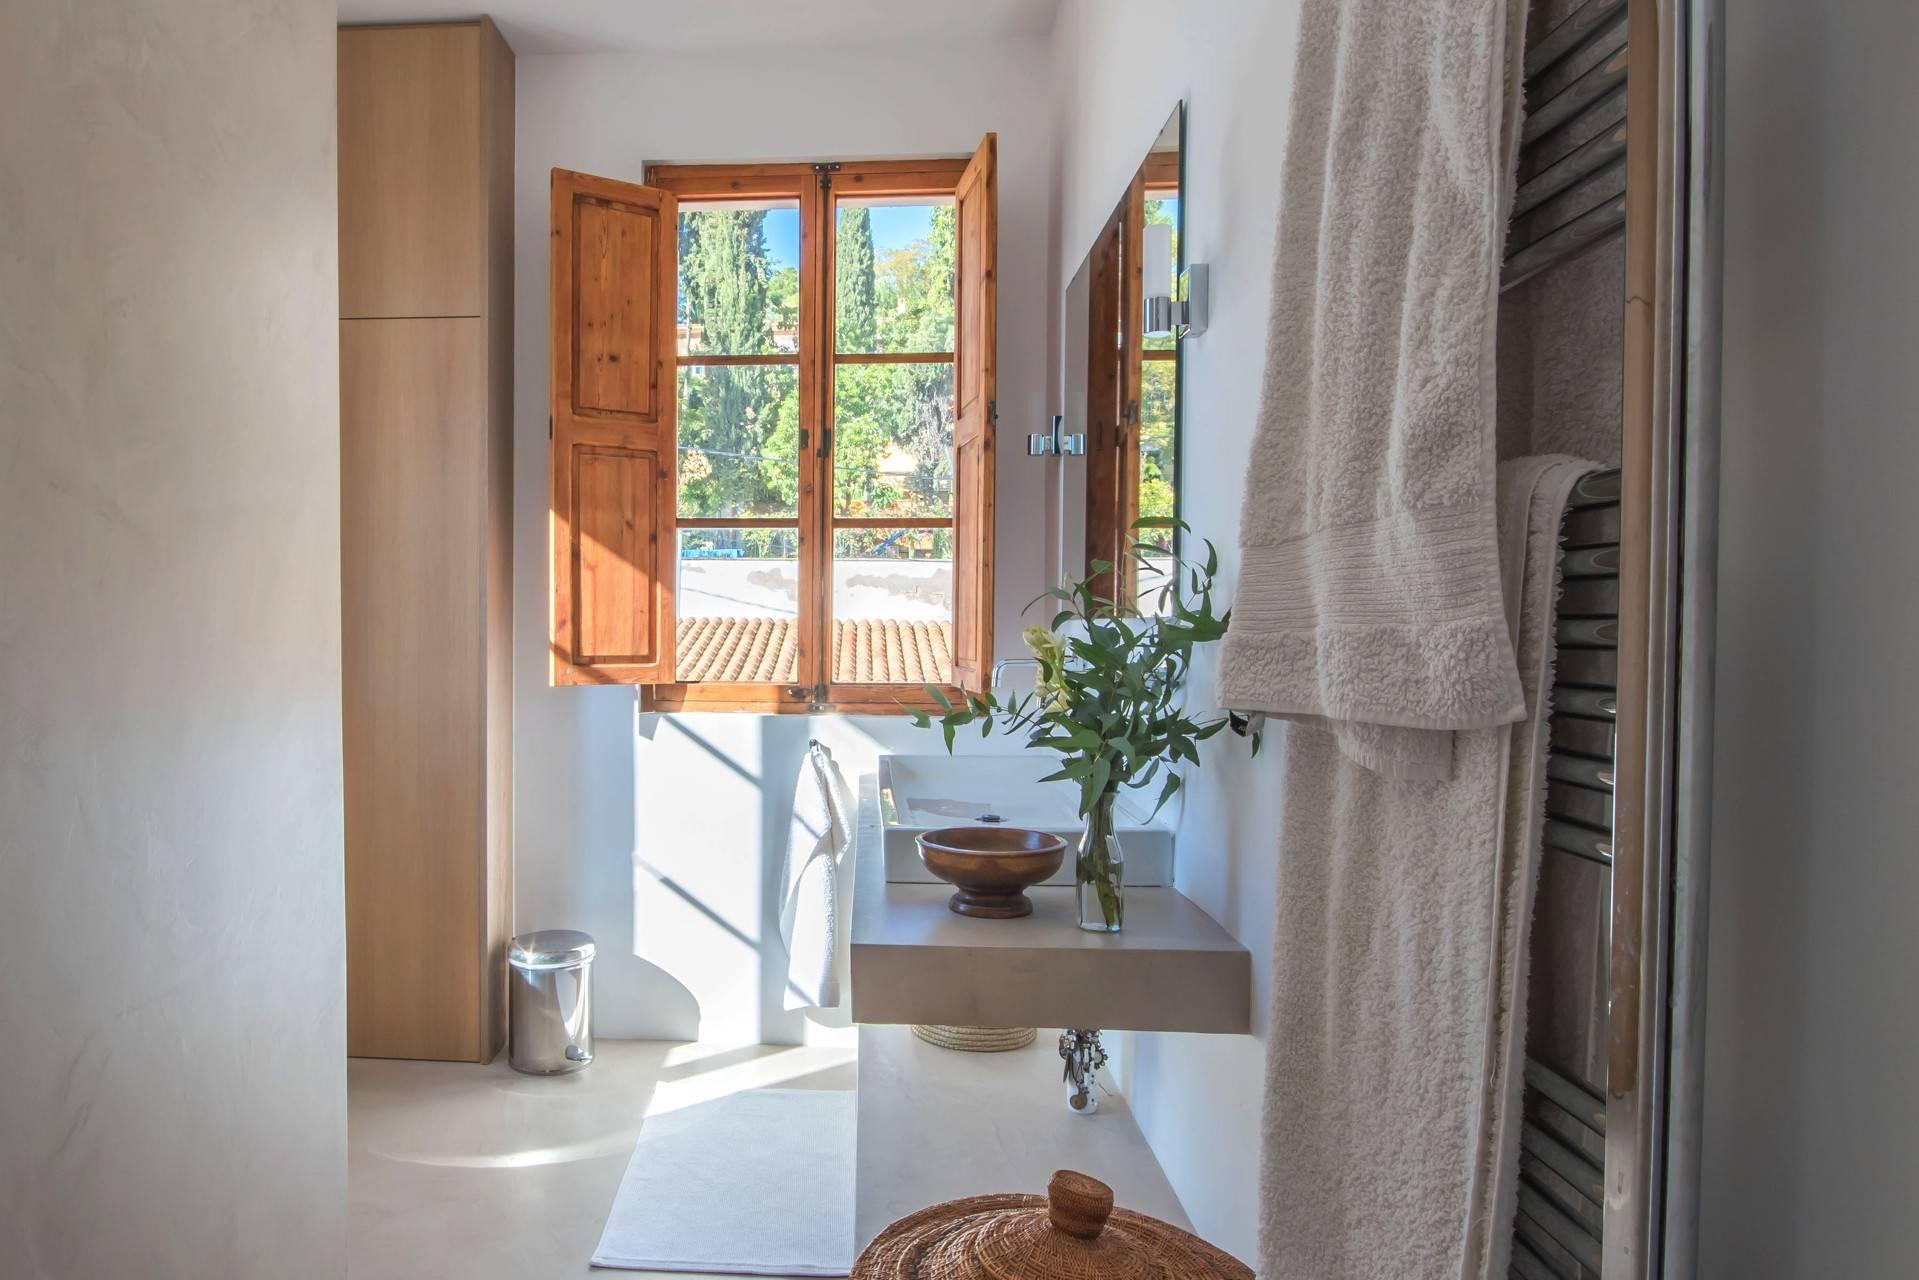 01-257 Luxus Ferienhaus Mallorca Südwesten Bild 17